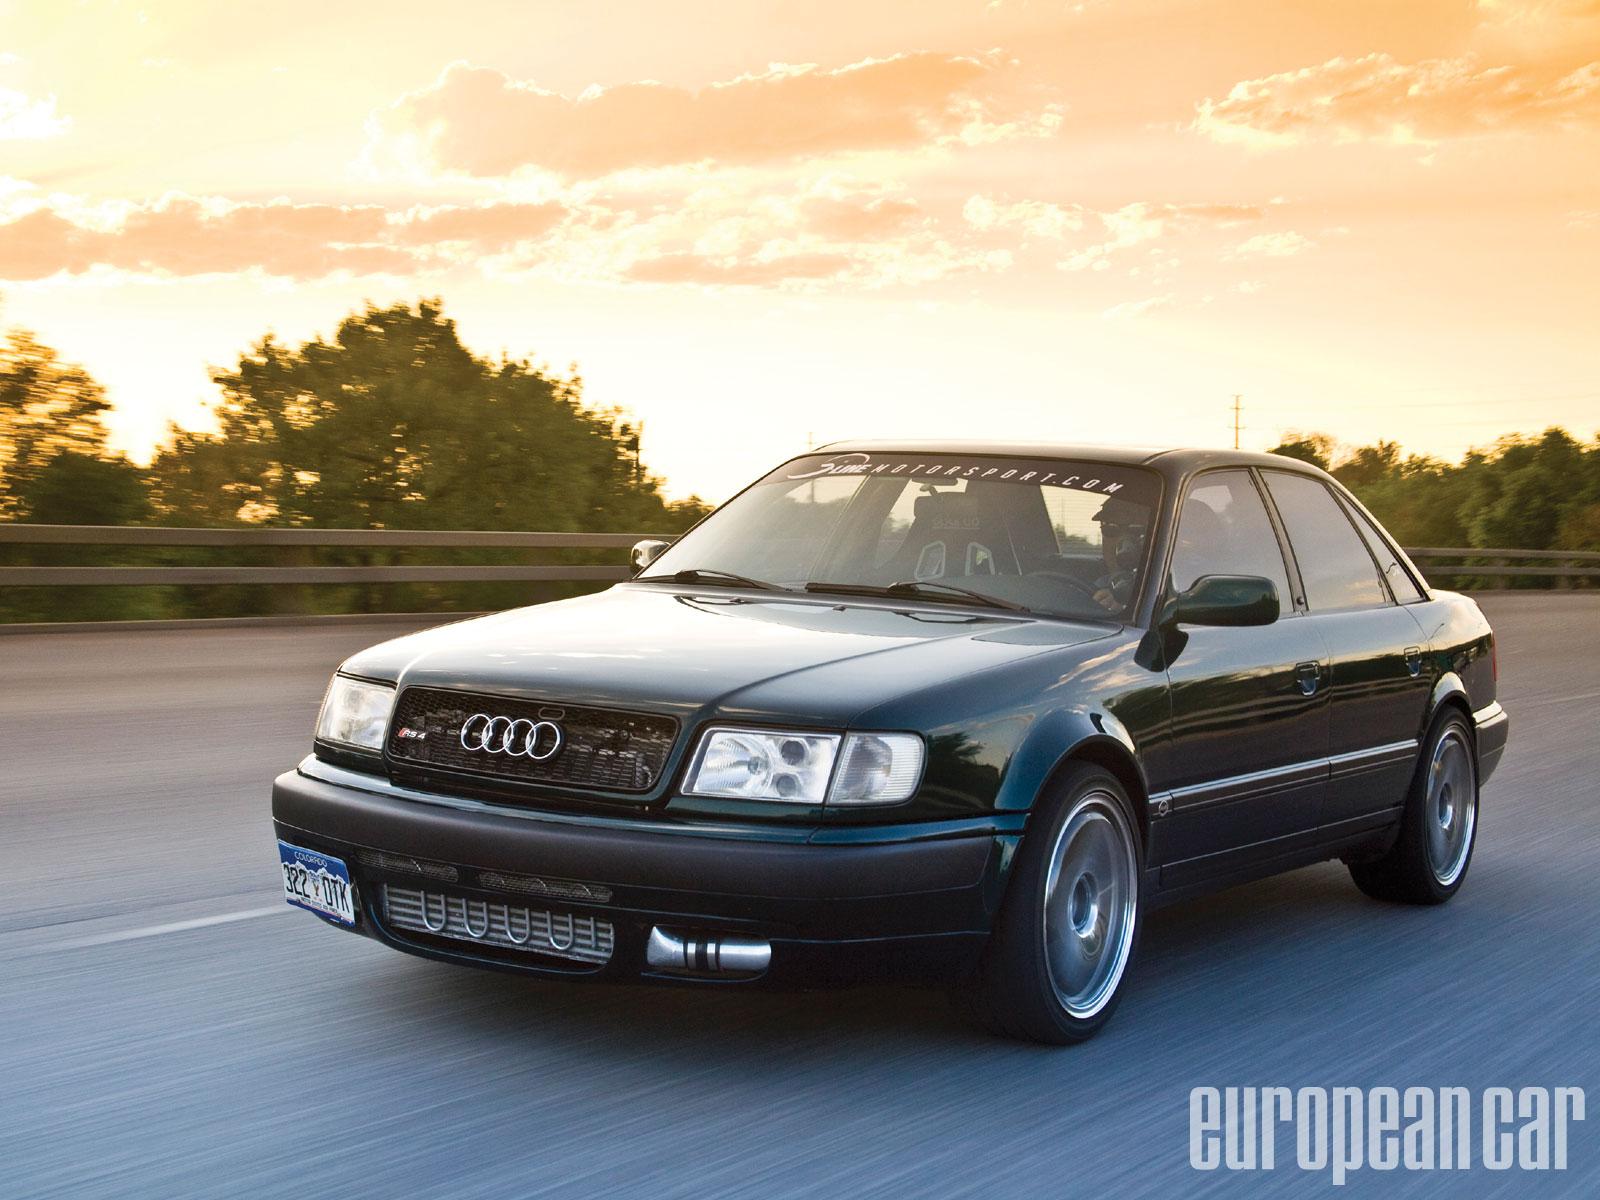 1993 Audi S4 Image 11